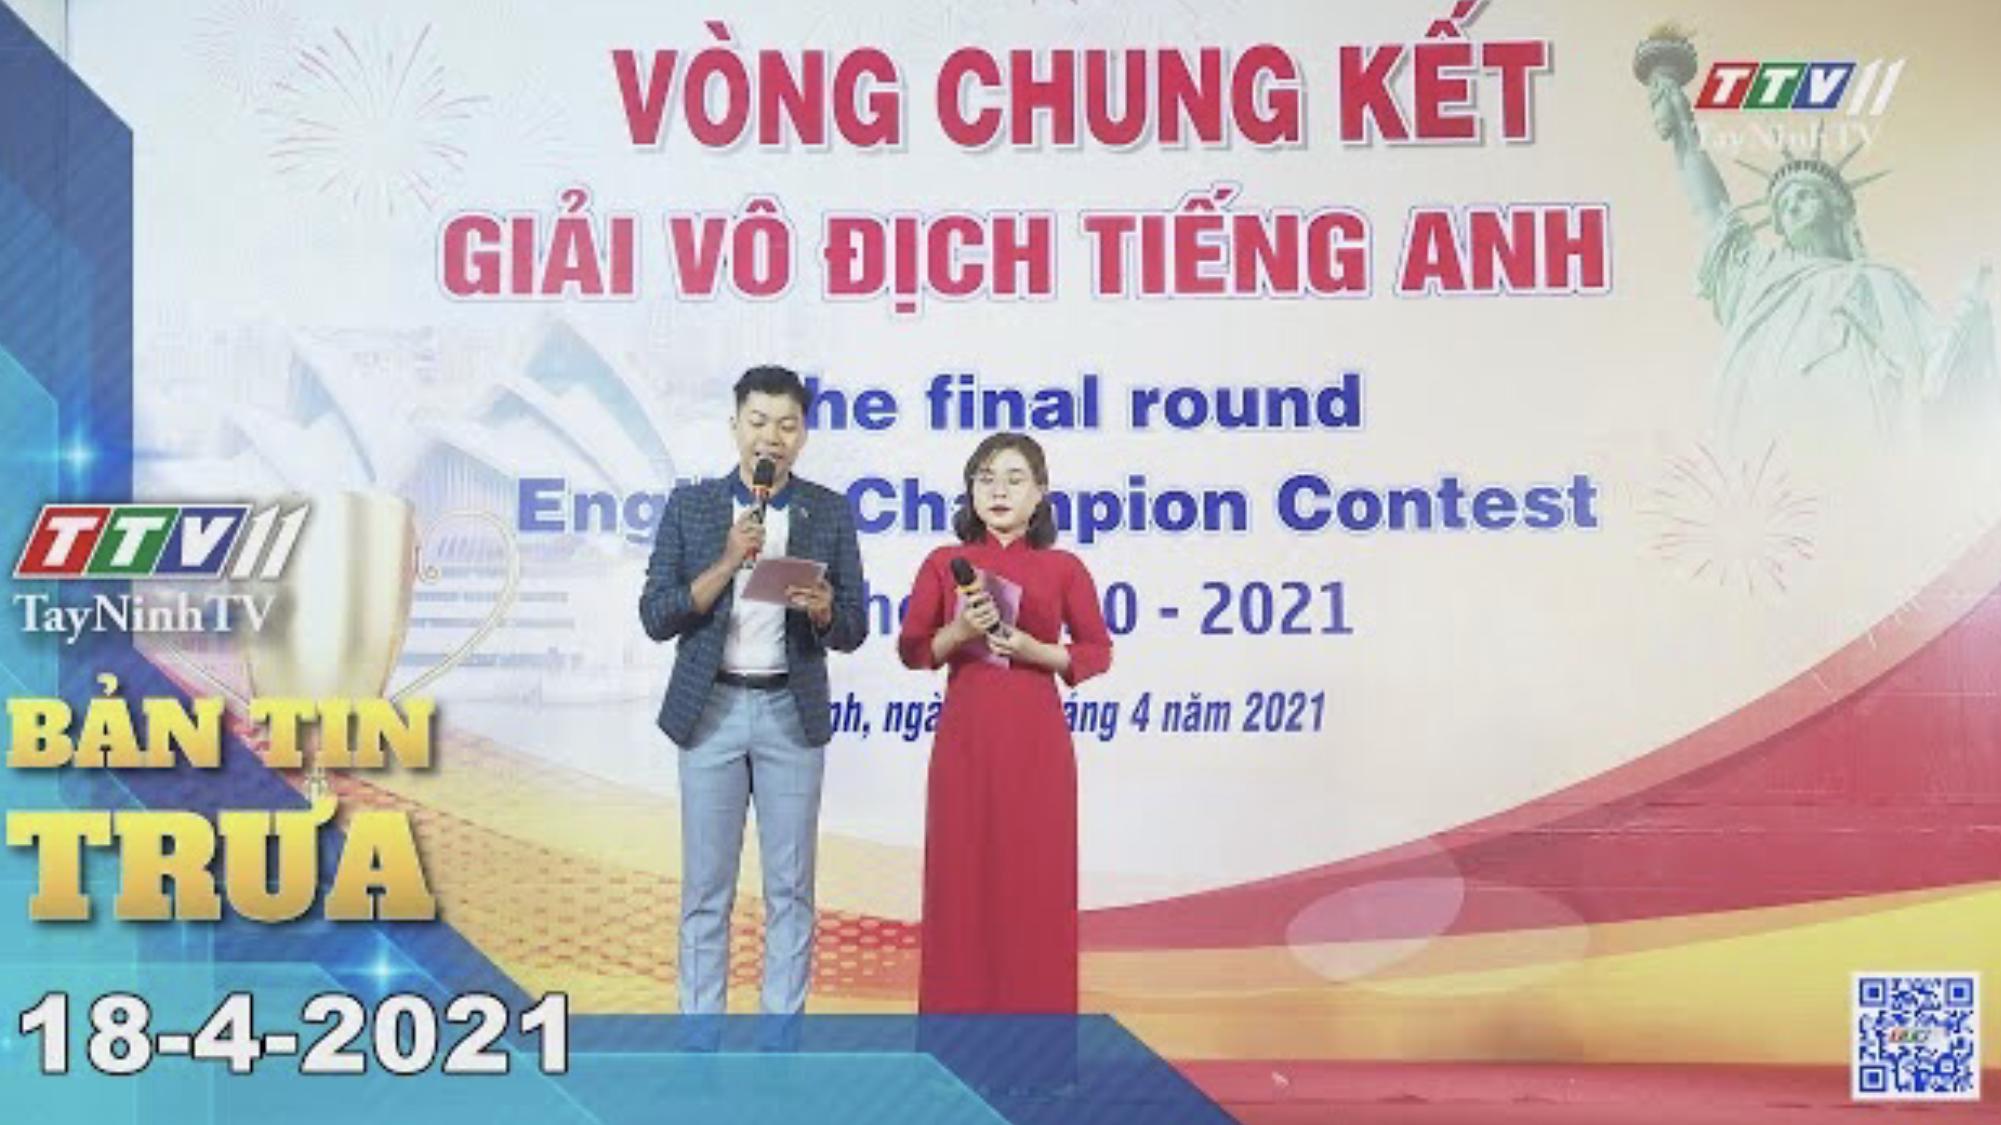 Bản tin trưa 18-4-2021 | Tin tức hôm nay | TayNinhTV